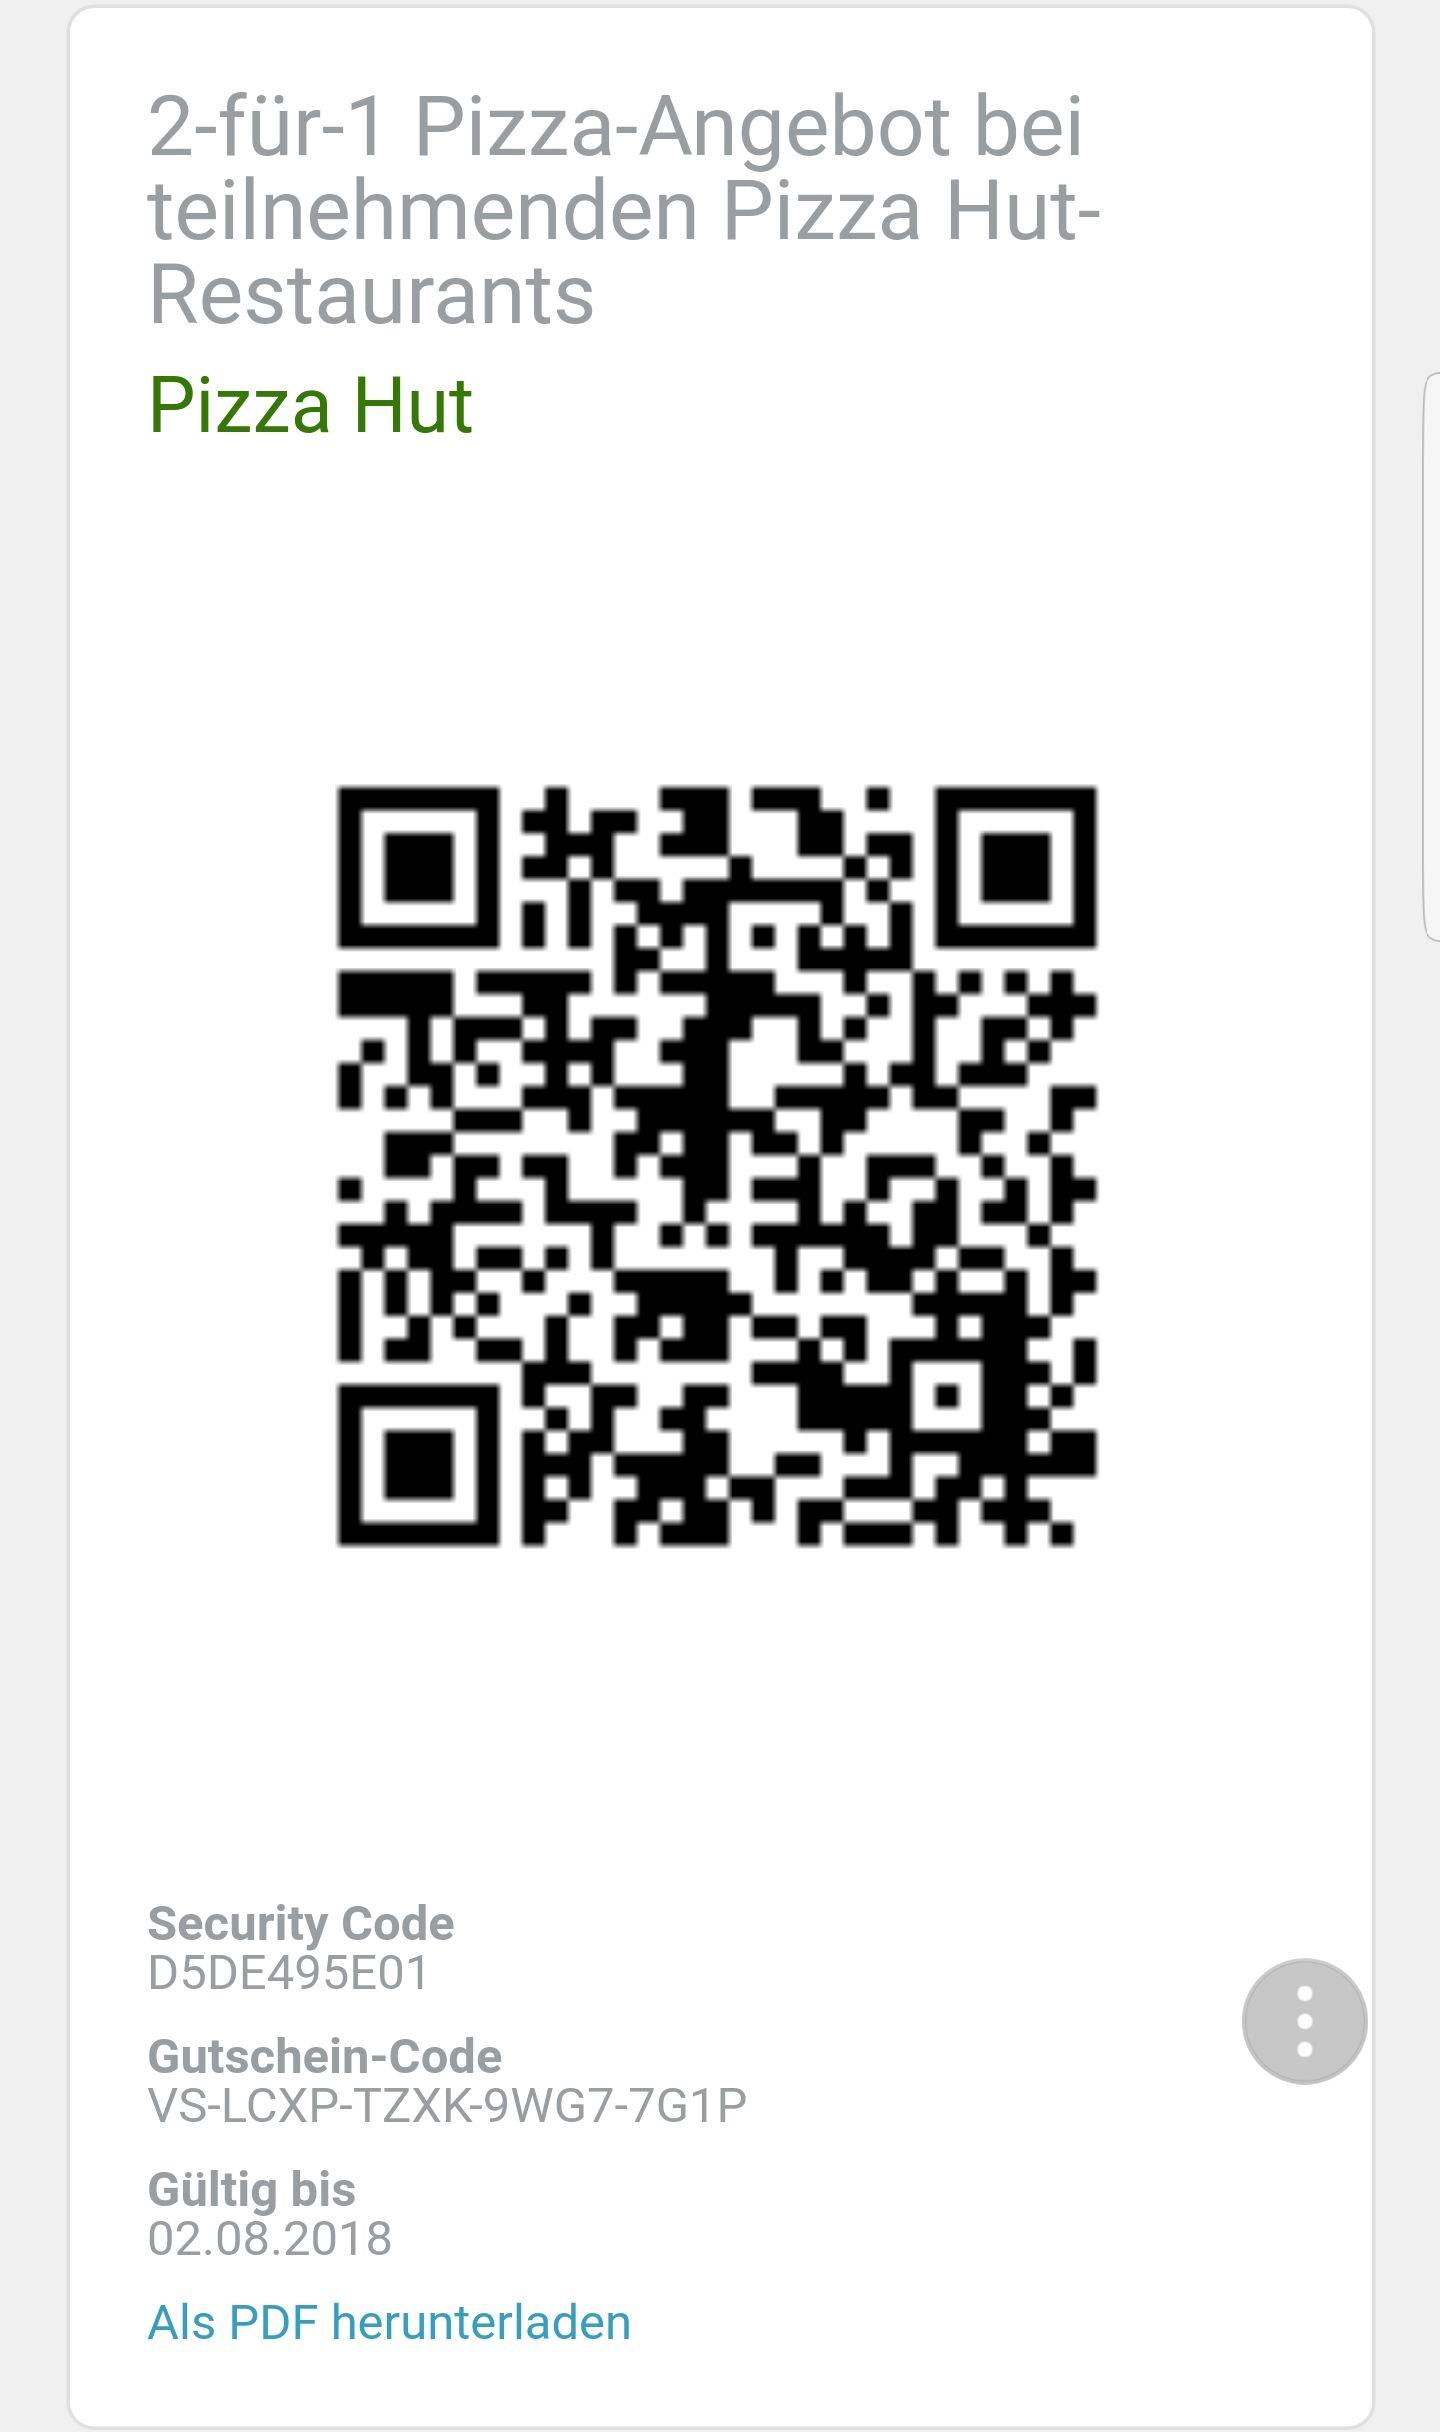 1210381-NMEbb.jpg